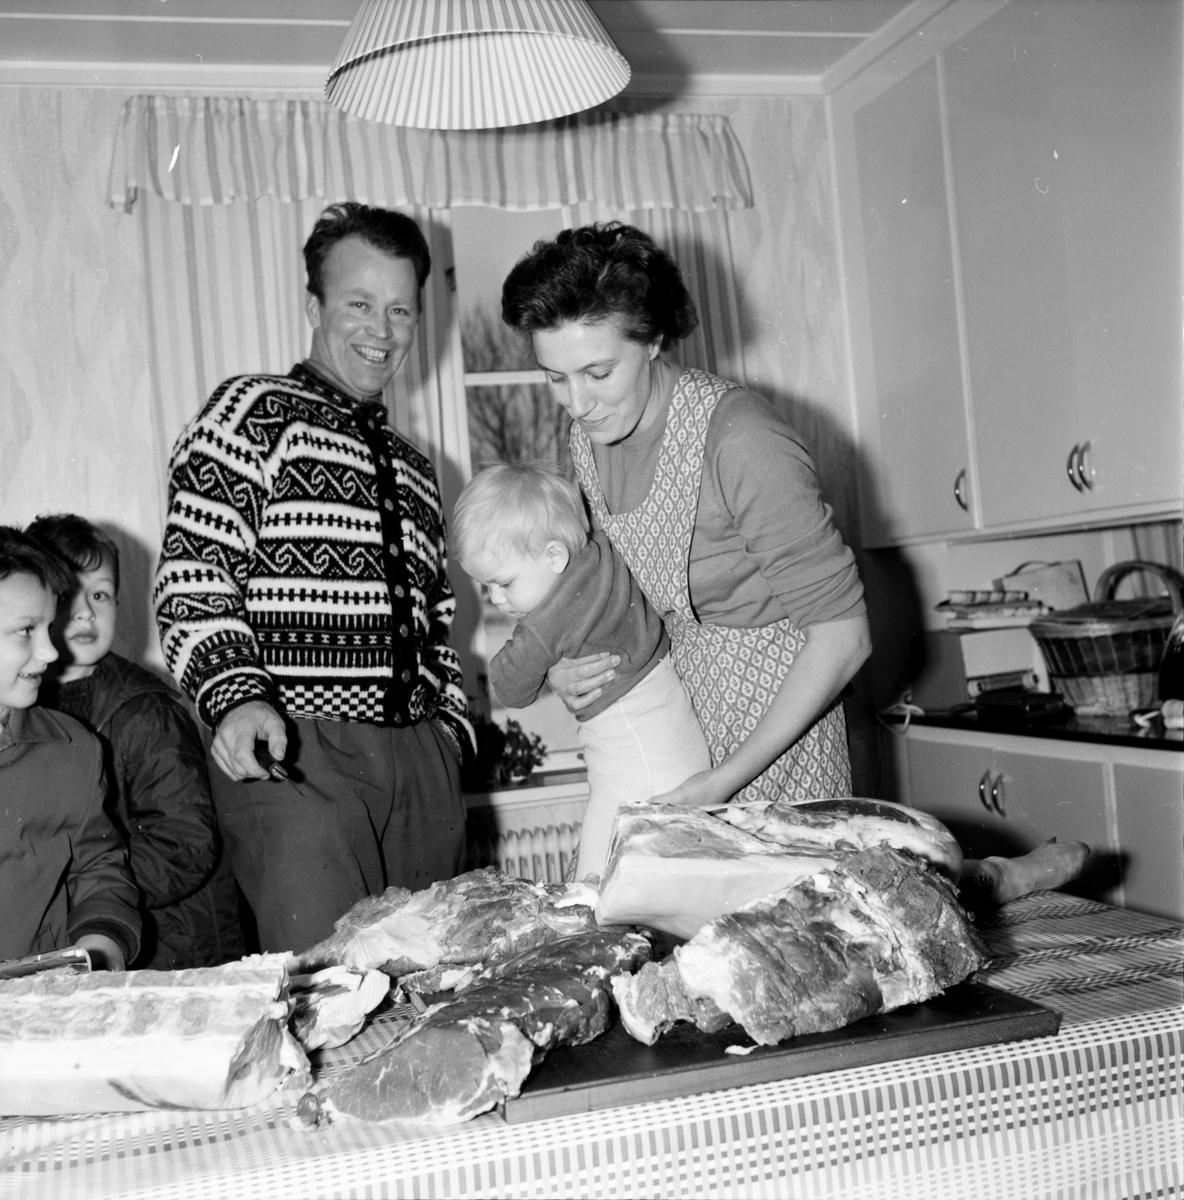 Söderala, Jonas F.Svensson i Norrbyn, 30 nov 1965